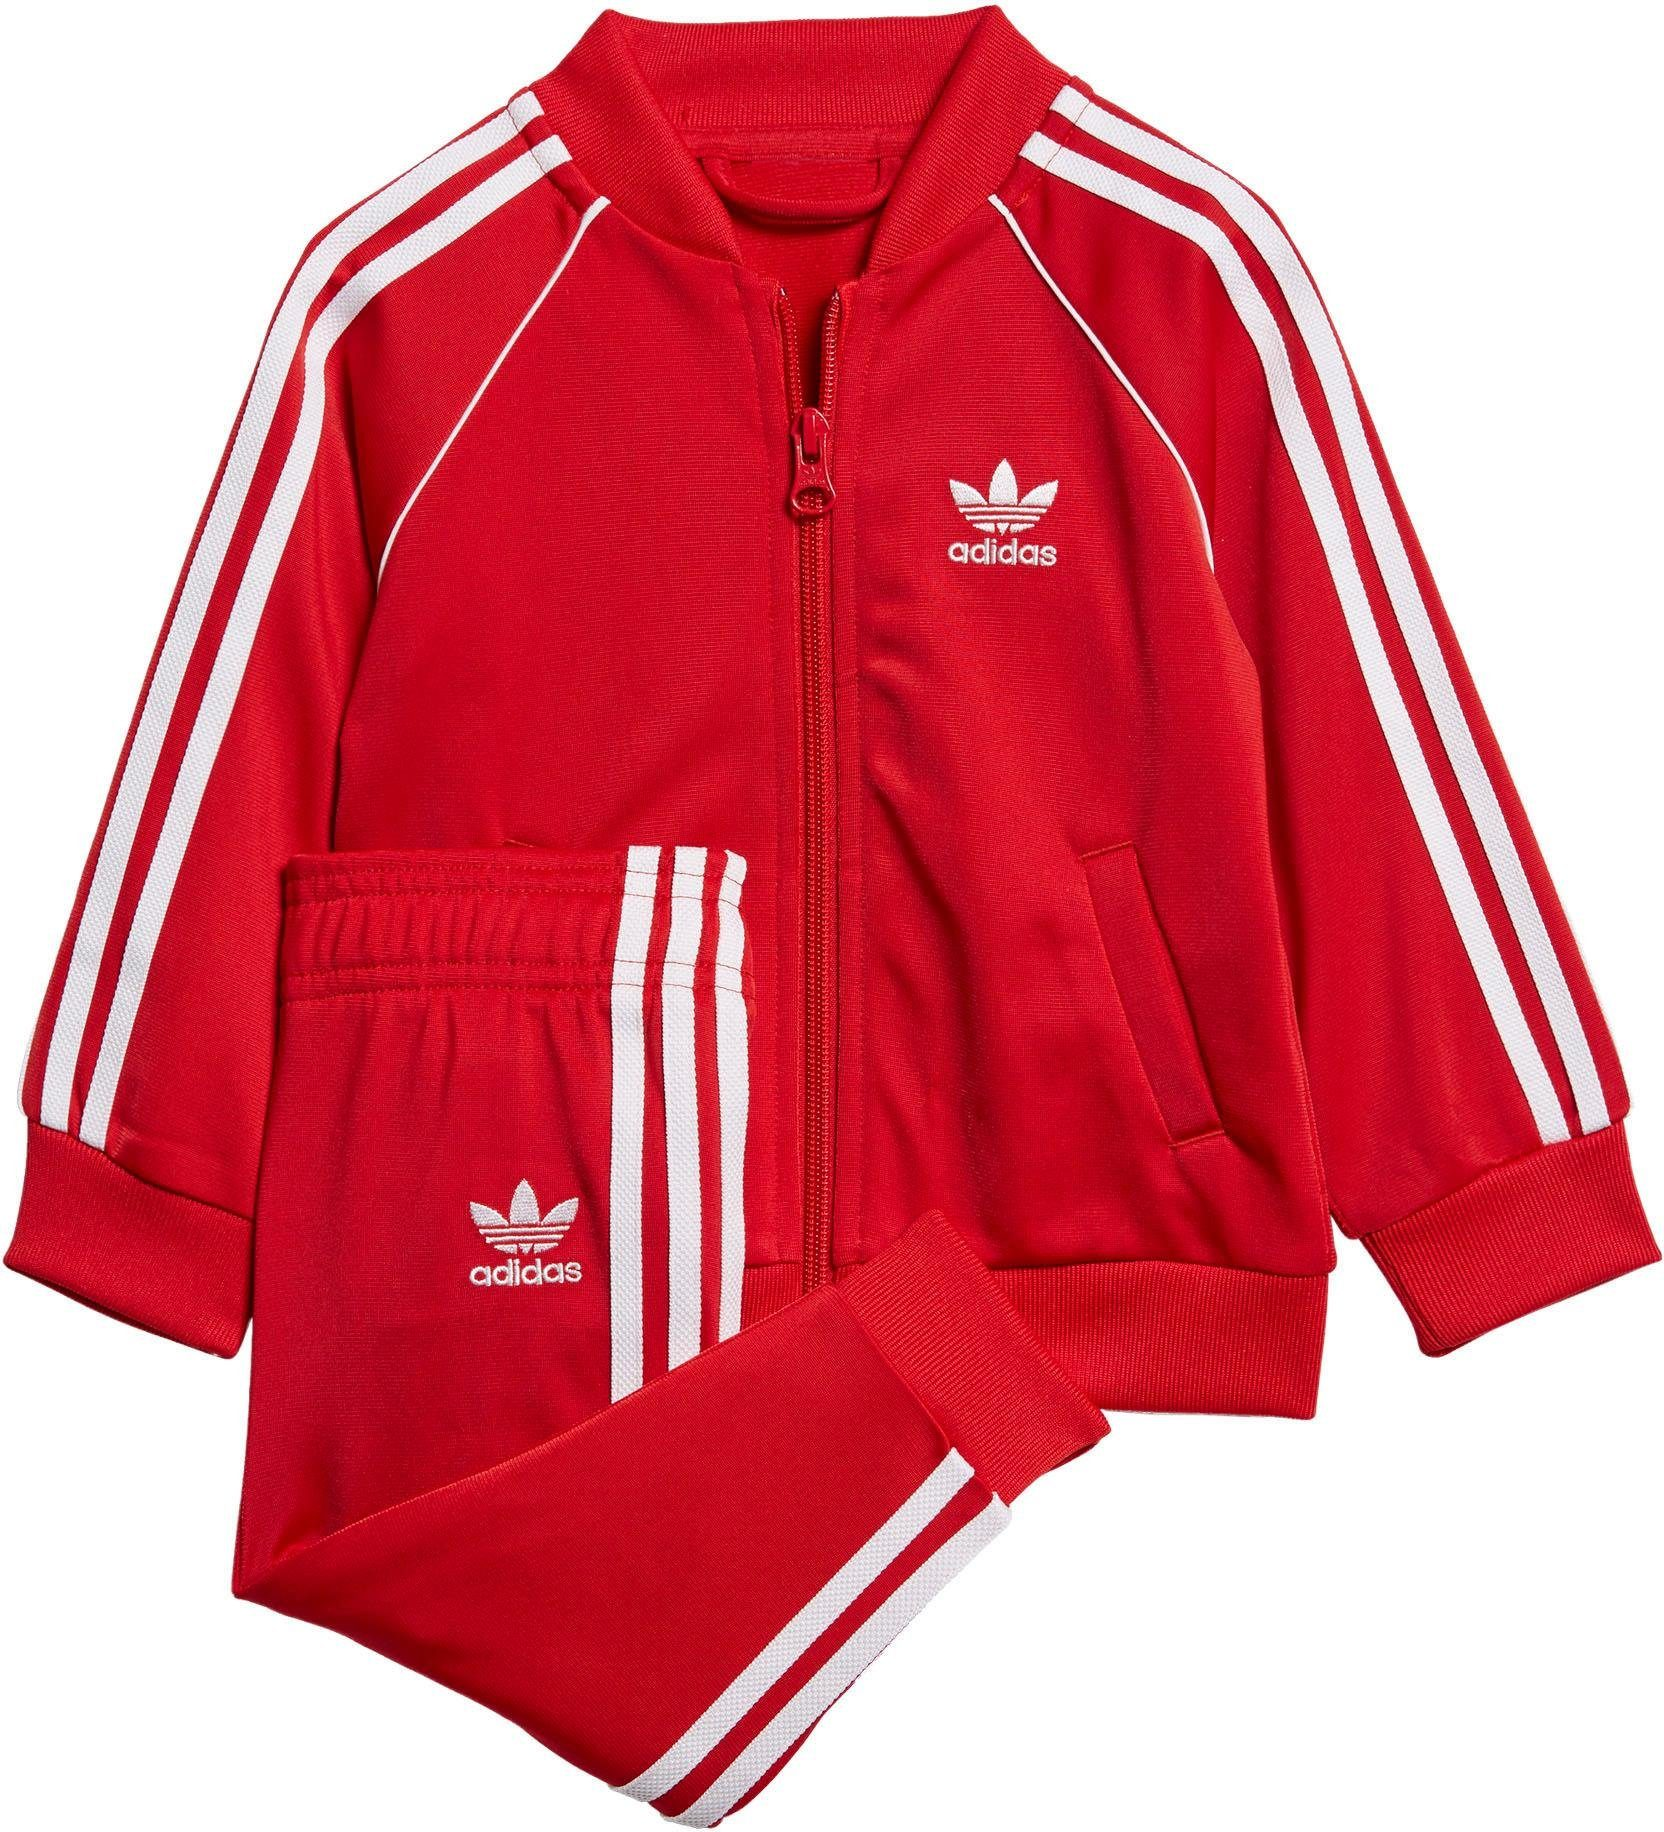 adidas Originals Trainingsanzug »SUPERSTAR SUIT« (Set, 2 tlg) online kaufen | OTTO